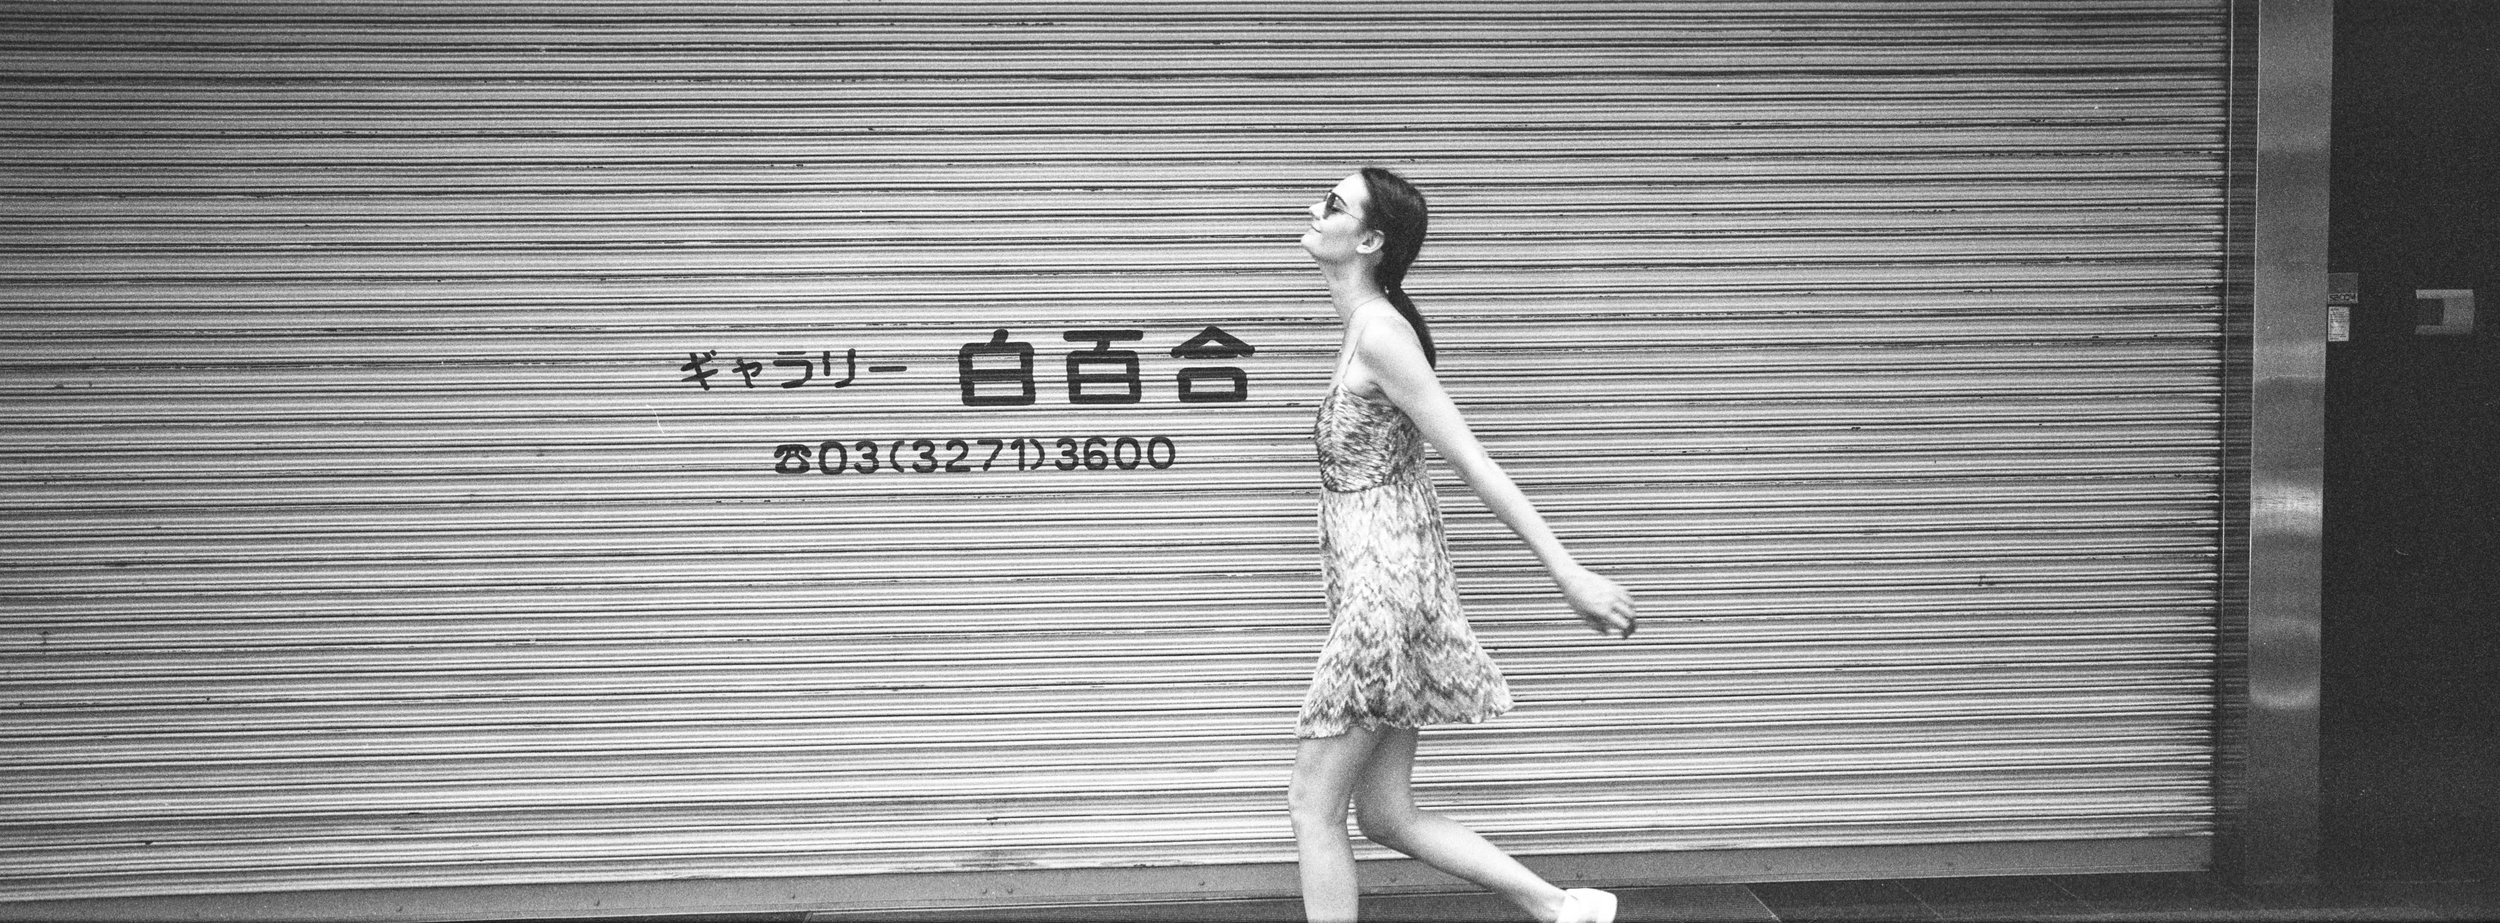 Silly walk, Ginza - JCH Street Pan 400